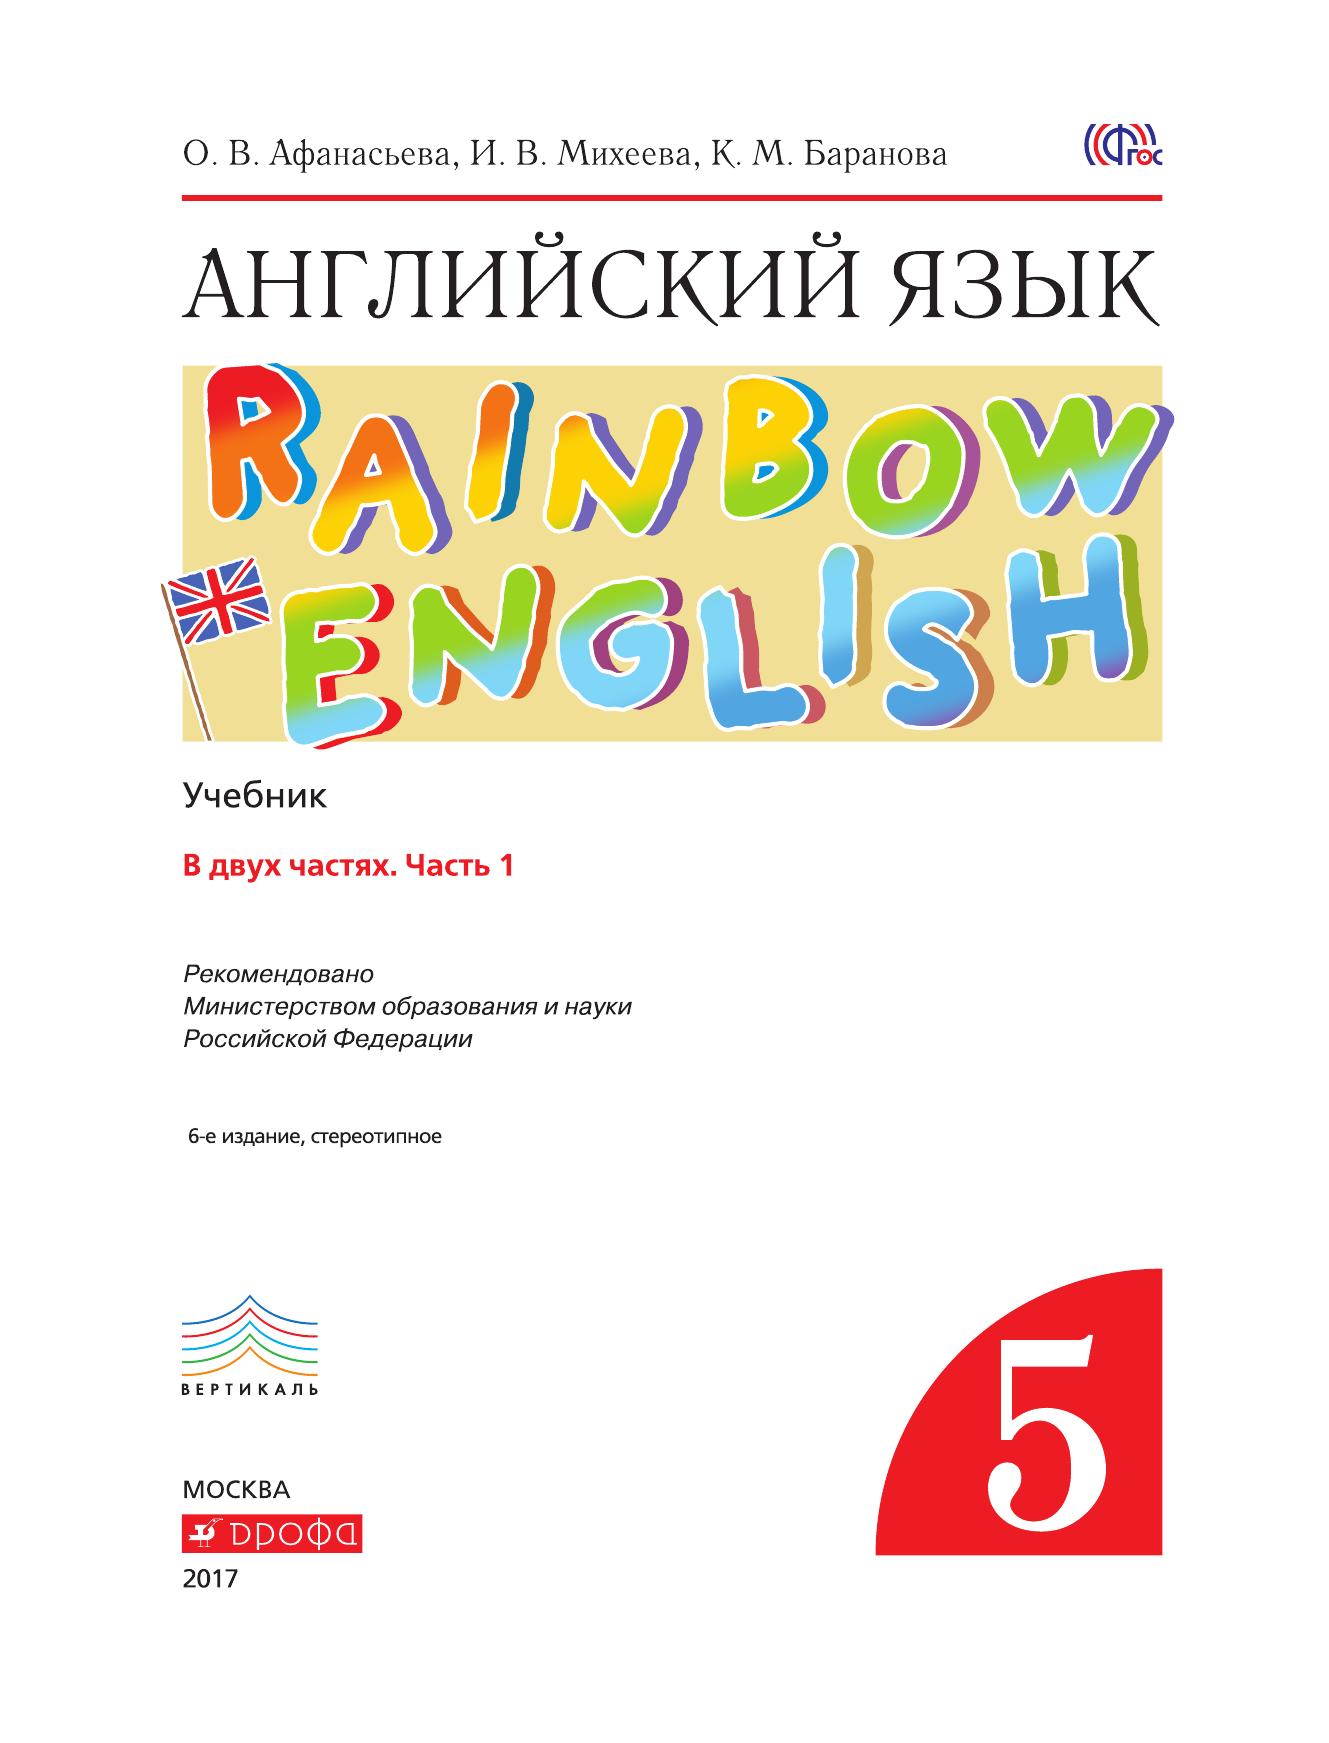 гдз по англ яз 5 класс афанасьева михеева учебник 2 часть